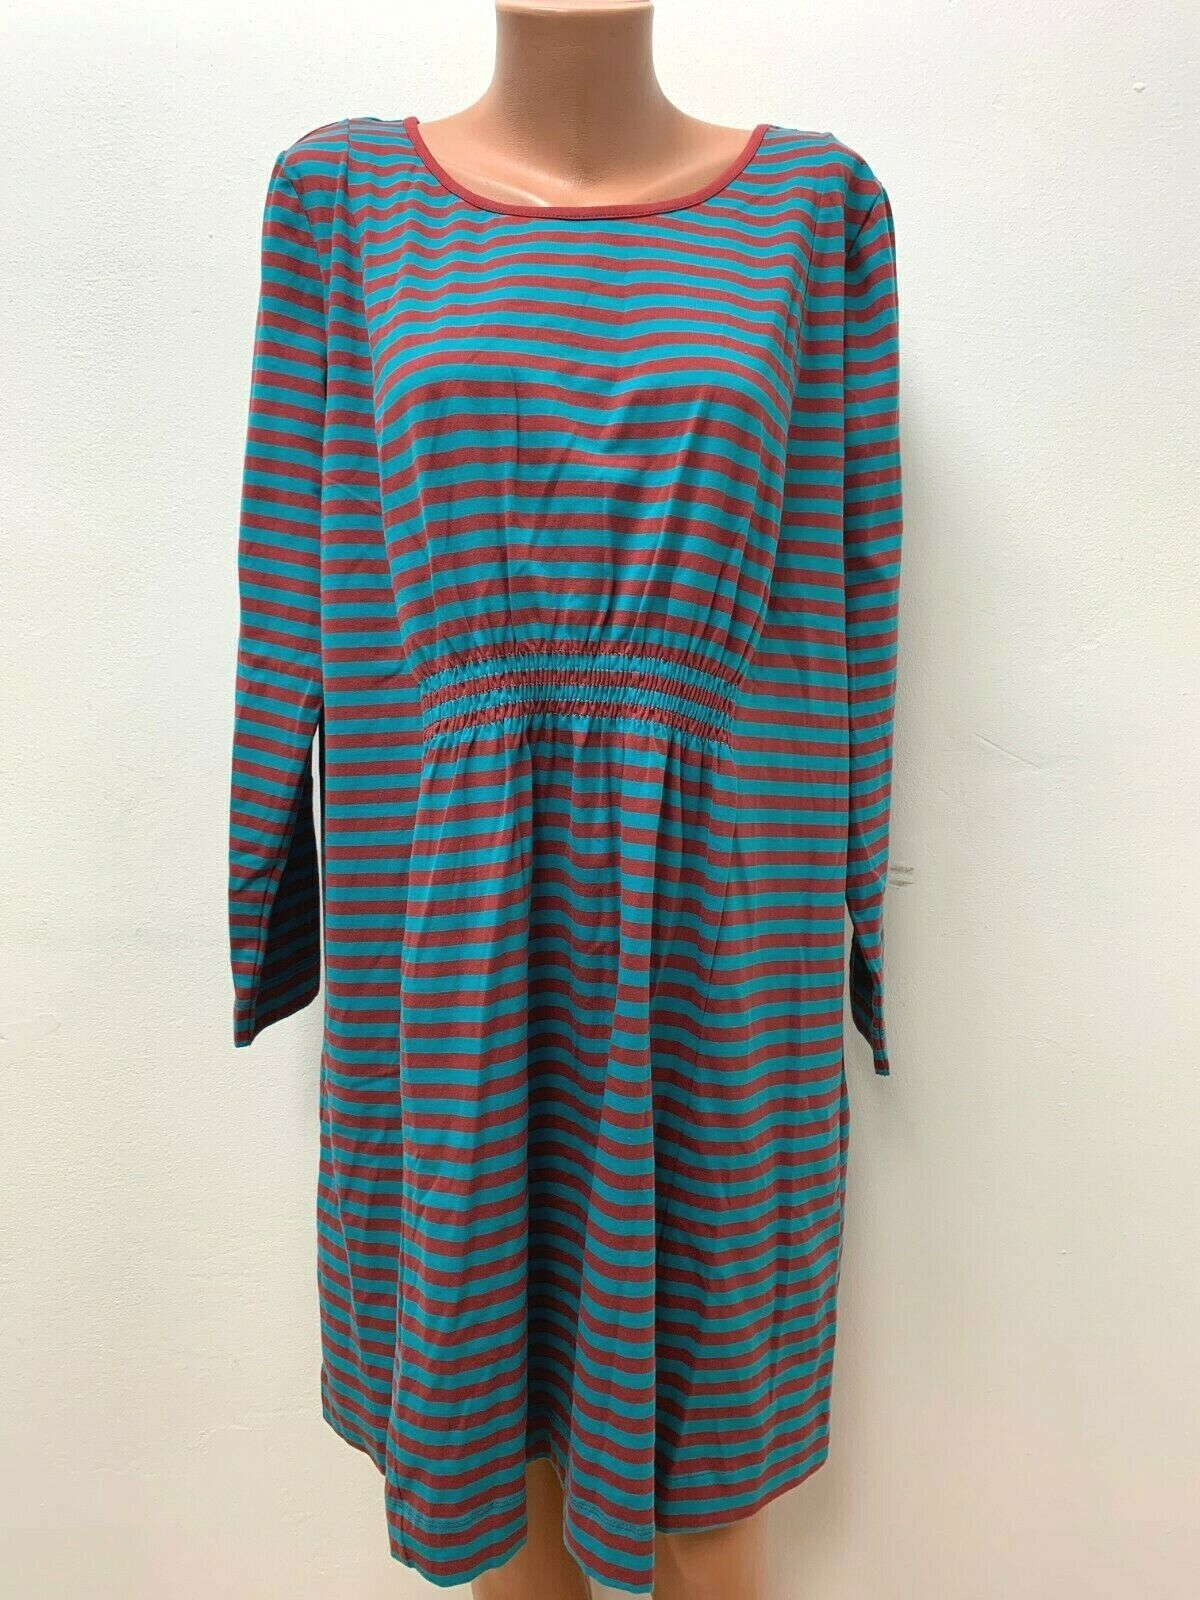 DEERBERG Gr.XXL 2XL Stretch Kleid Jersey Blau Rot Gestreift langarm